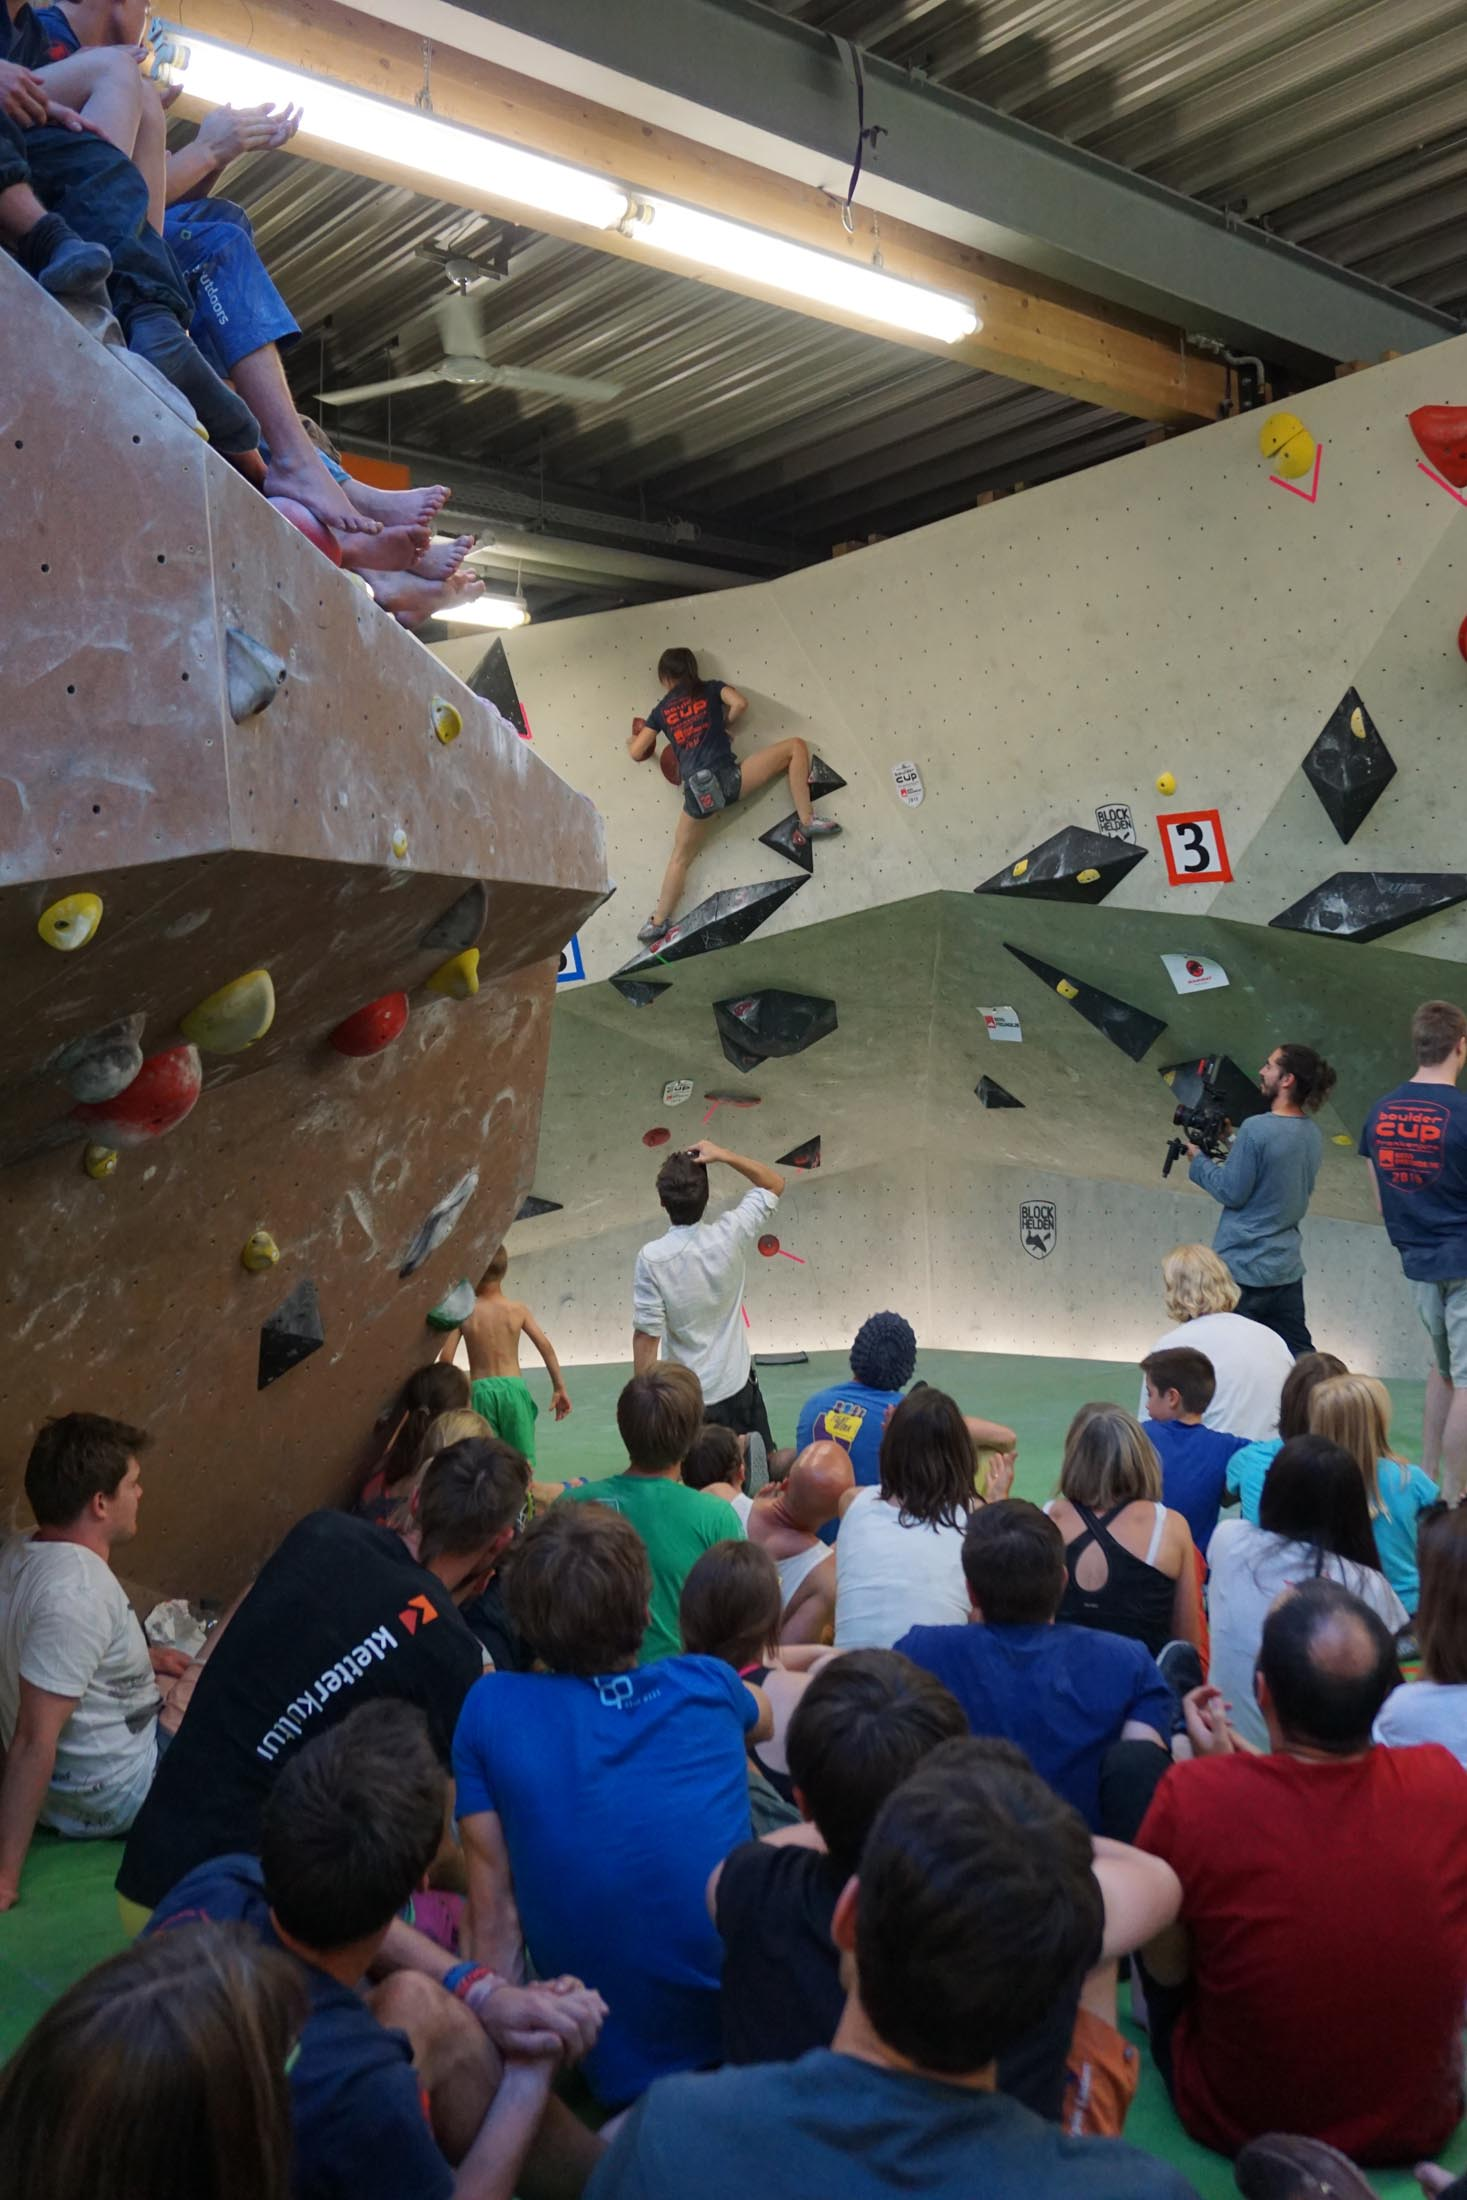 Finale, internationaler bouldercup Frankenjura 2016, BLOCKHELDEN Erlangen, Mammut, Bergfreunde.de, Boulderwettkampf07092016714